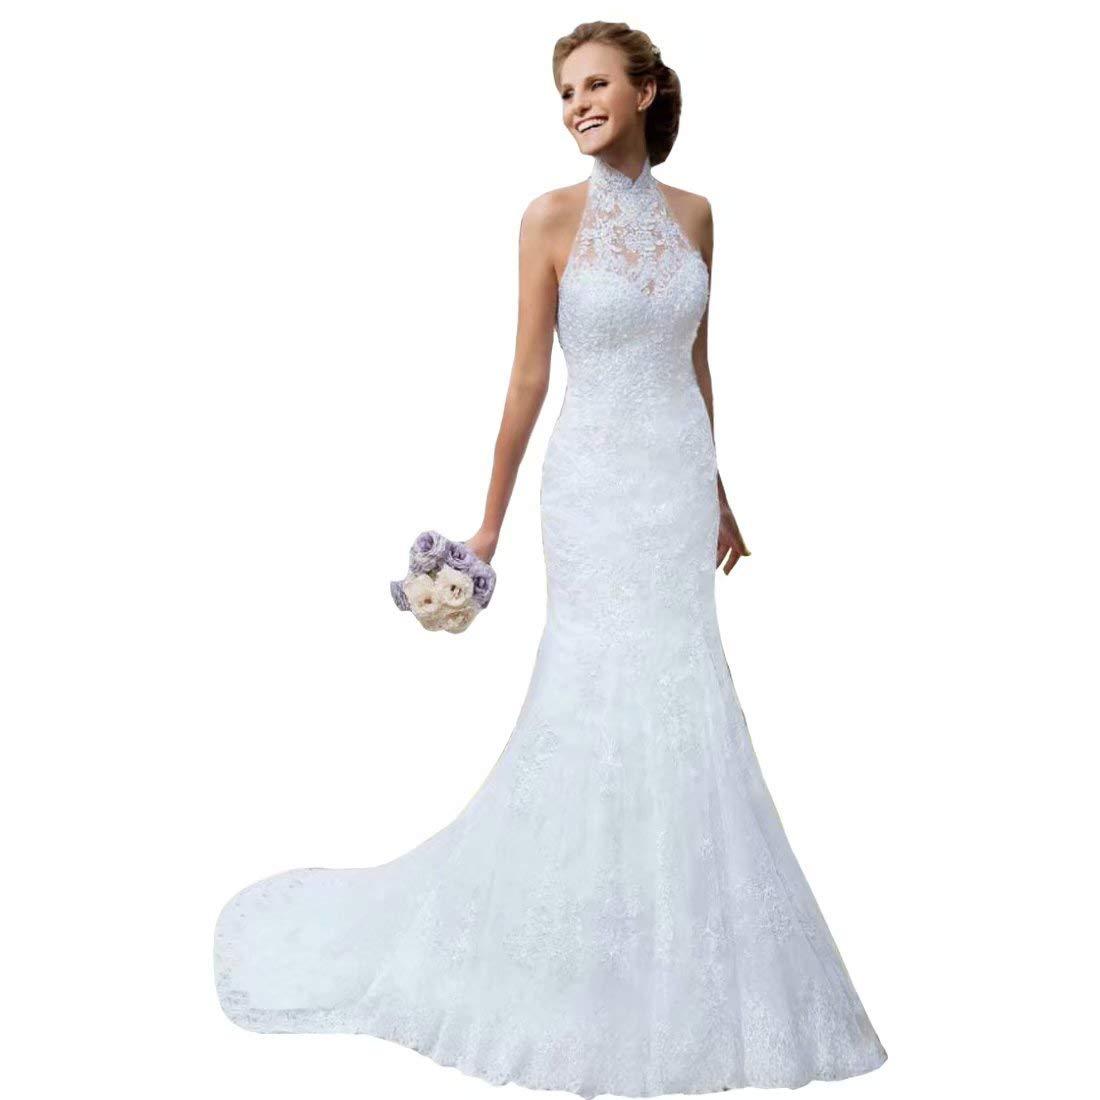 Dingdingmail Vintage Lace Mermaid Wedding Dresses 2019 High